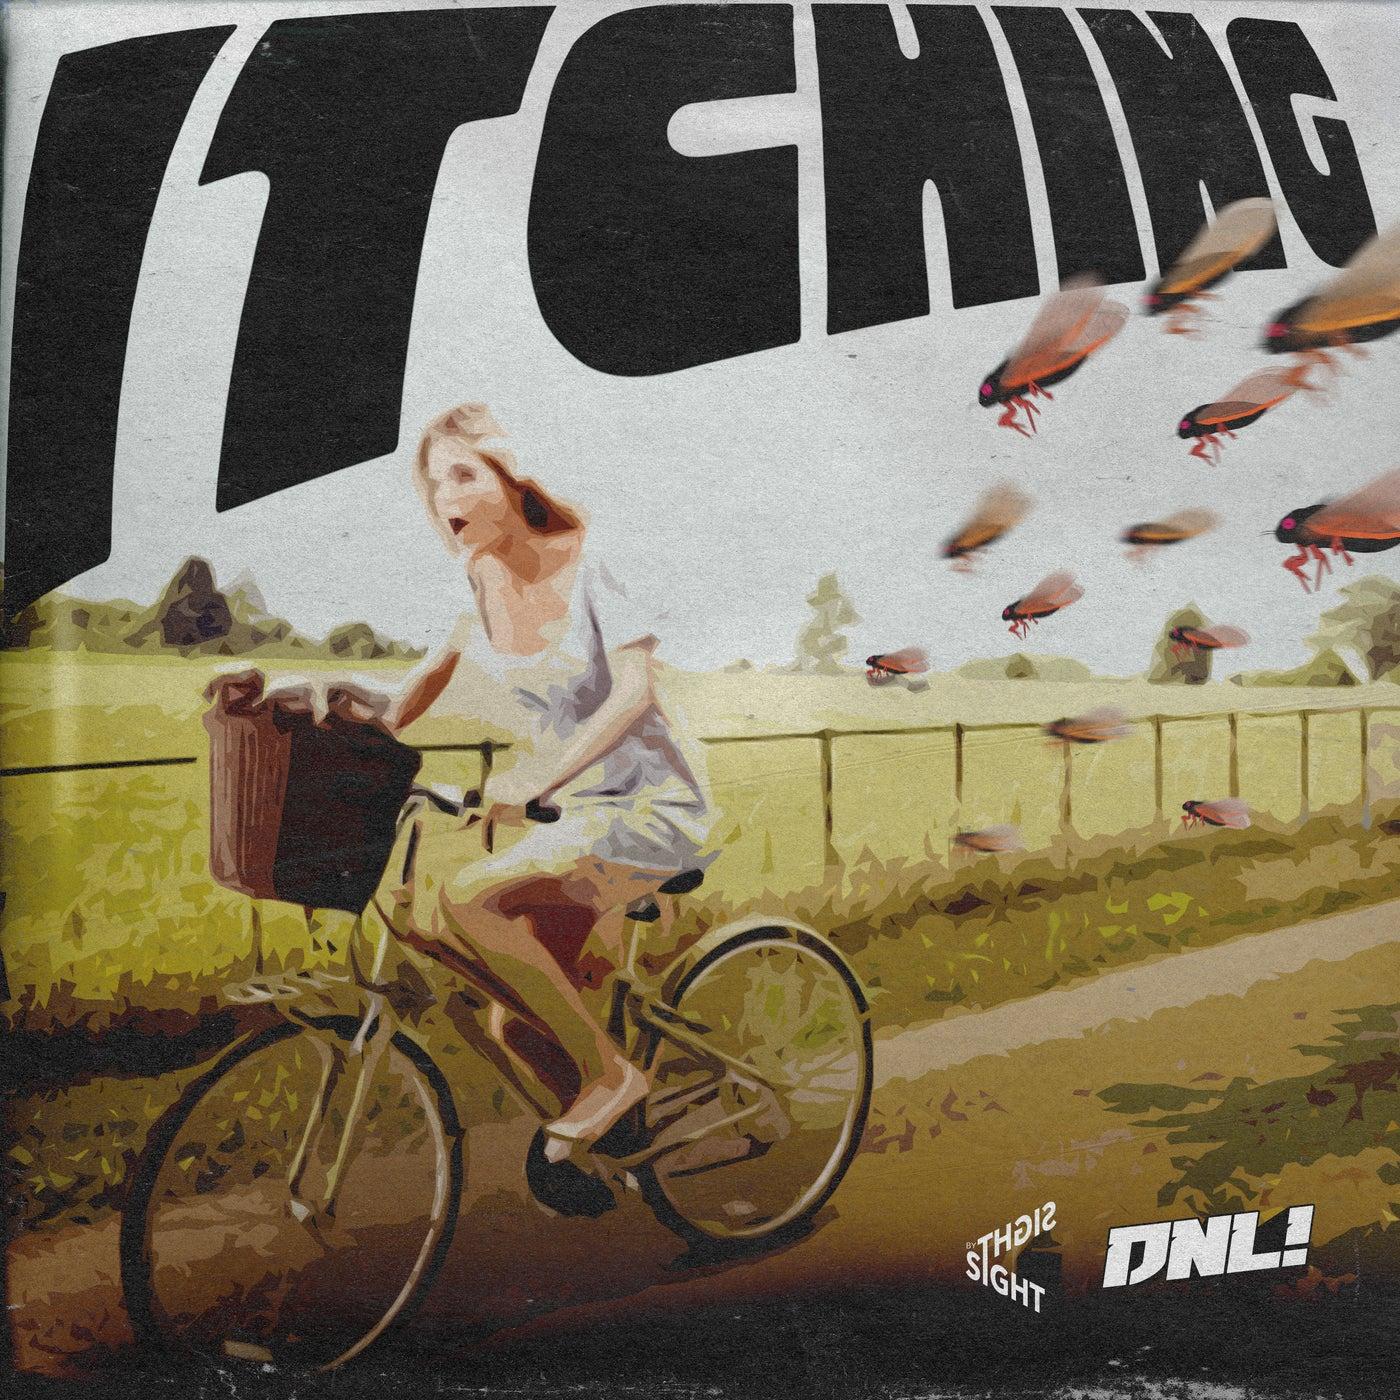 Cash Doll (Original Mix)